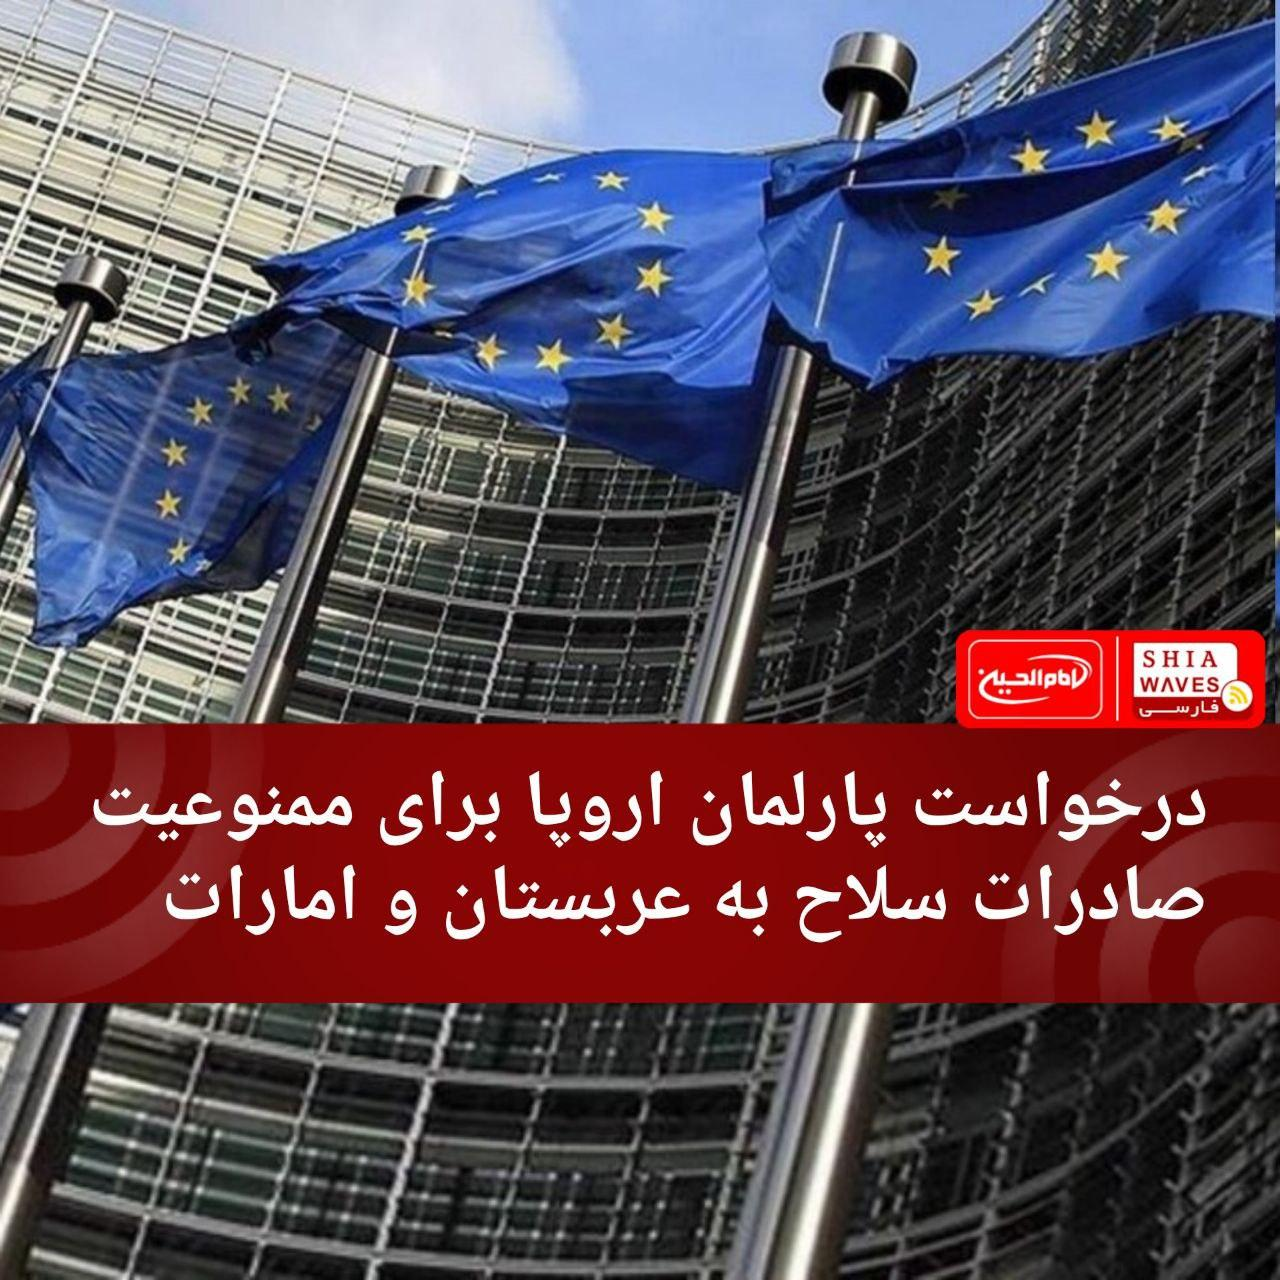 Photo of درخواست پارلمان اروپا برای ممنوعیت صادرات سلاح به عربستان و امارات